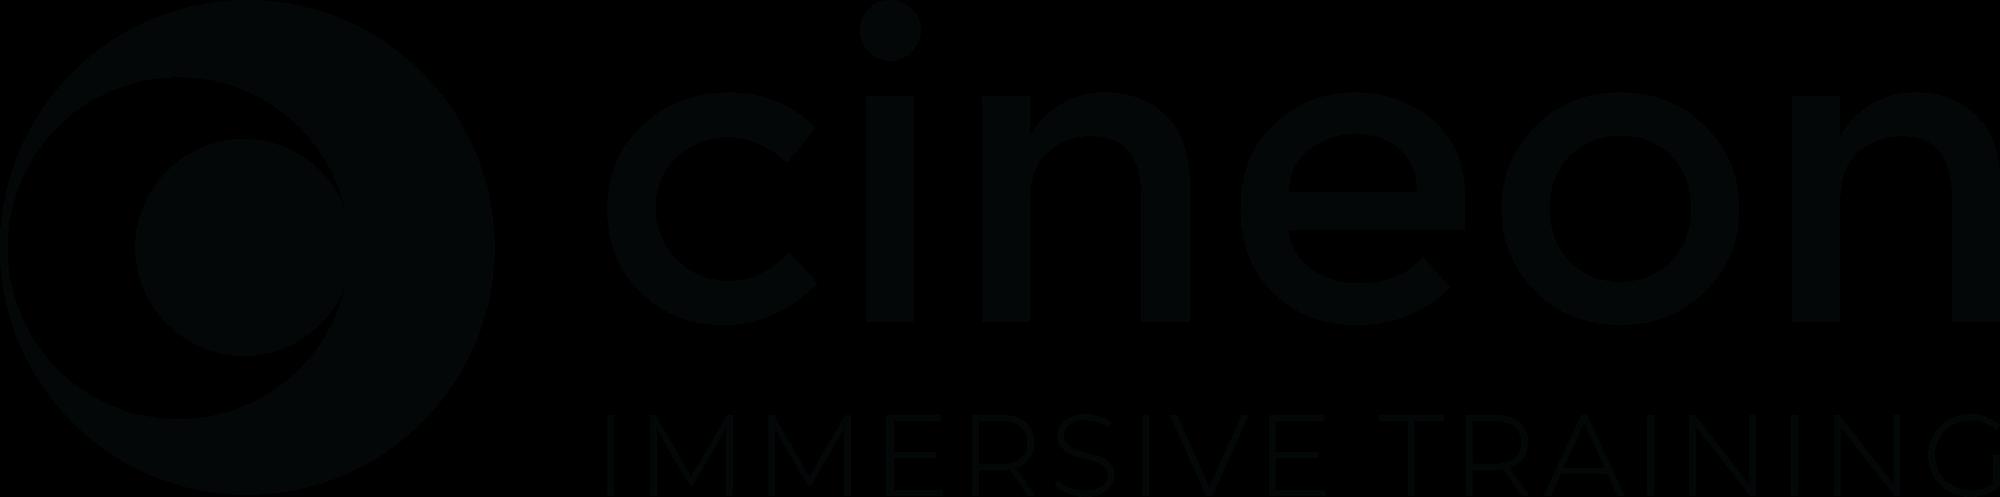 Cineon Immersive Training